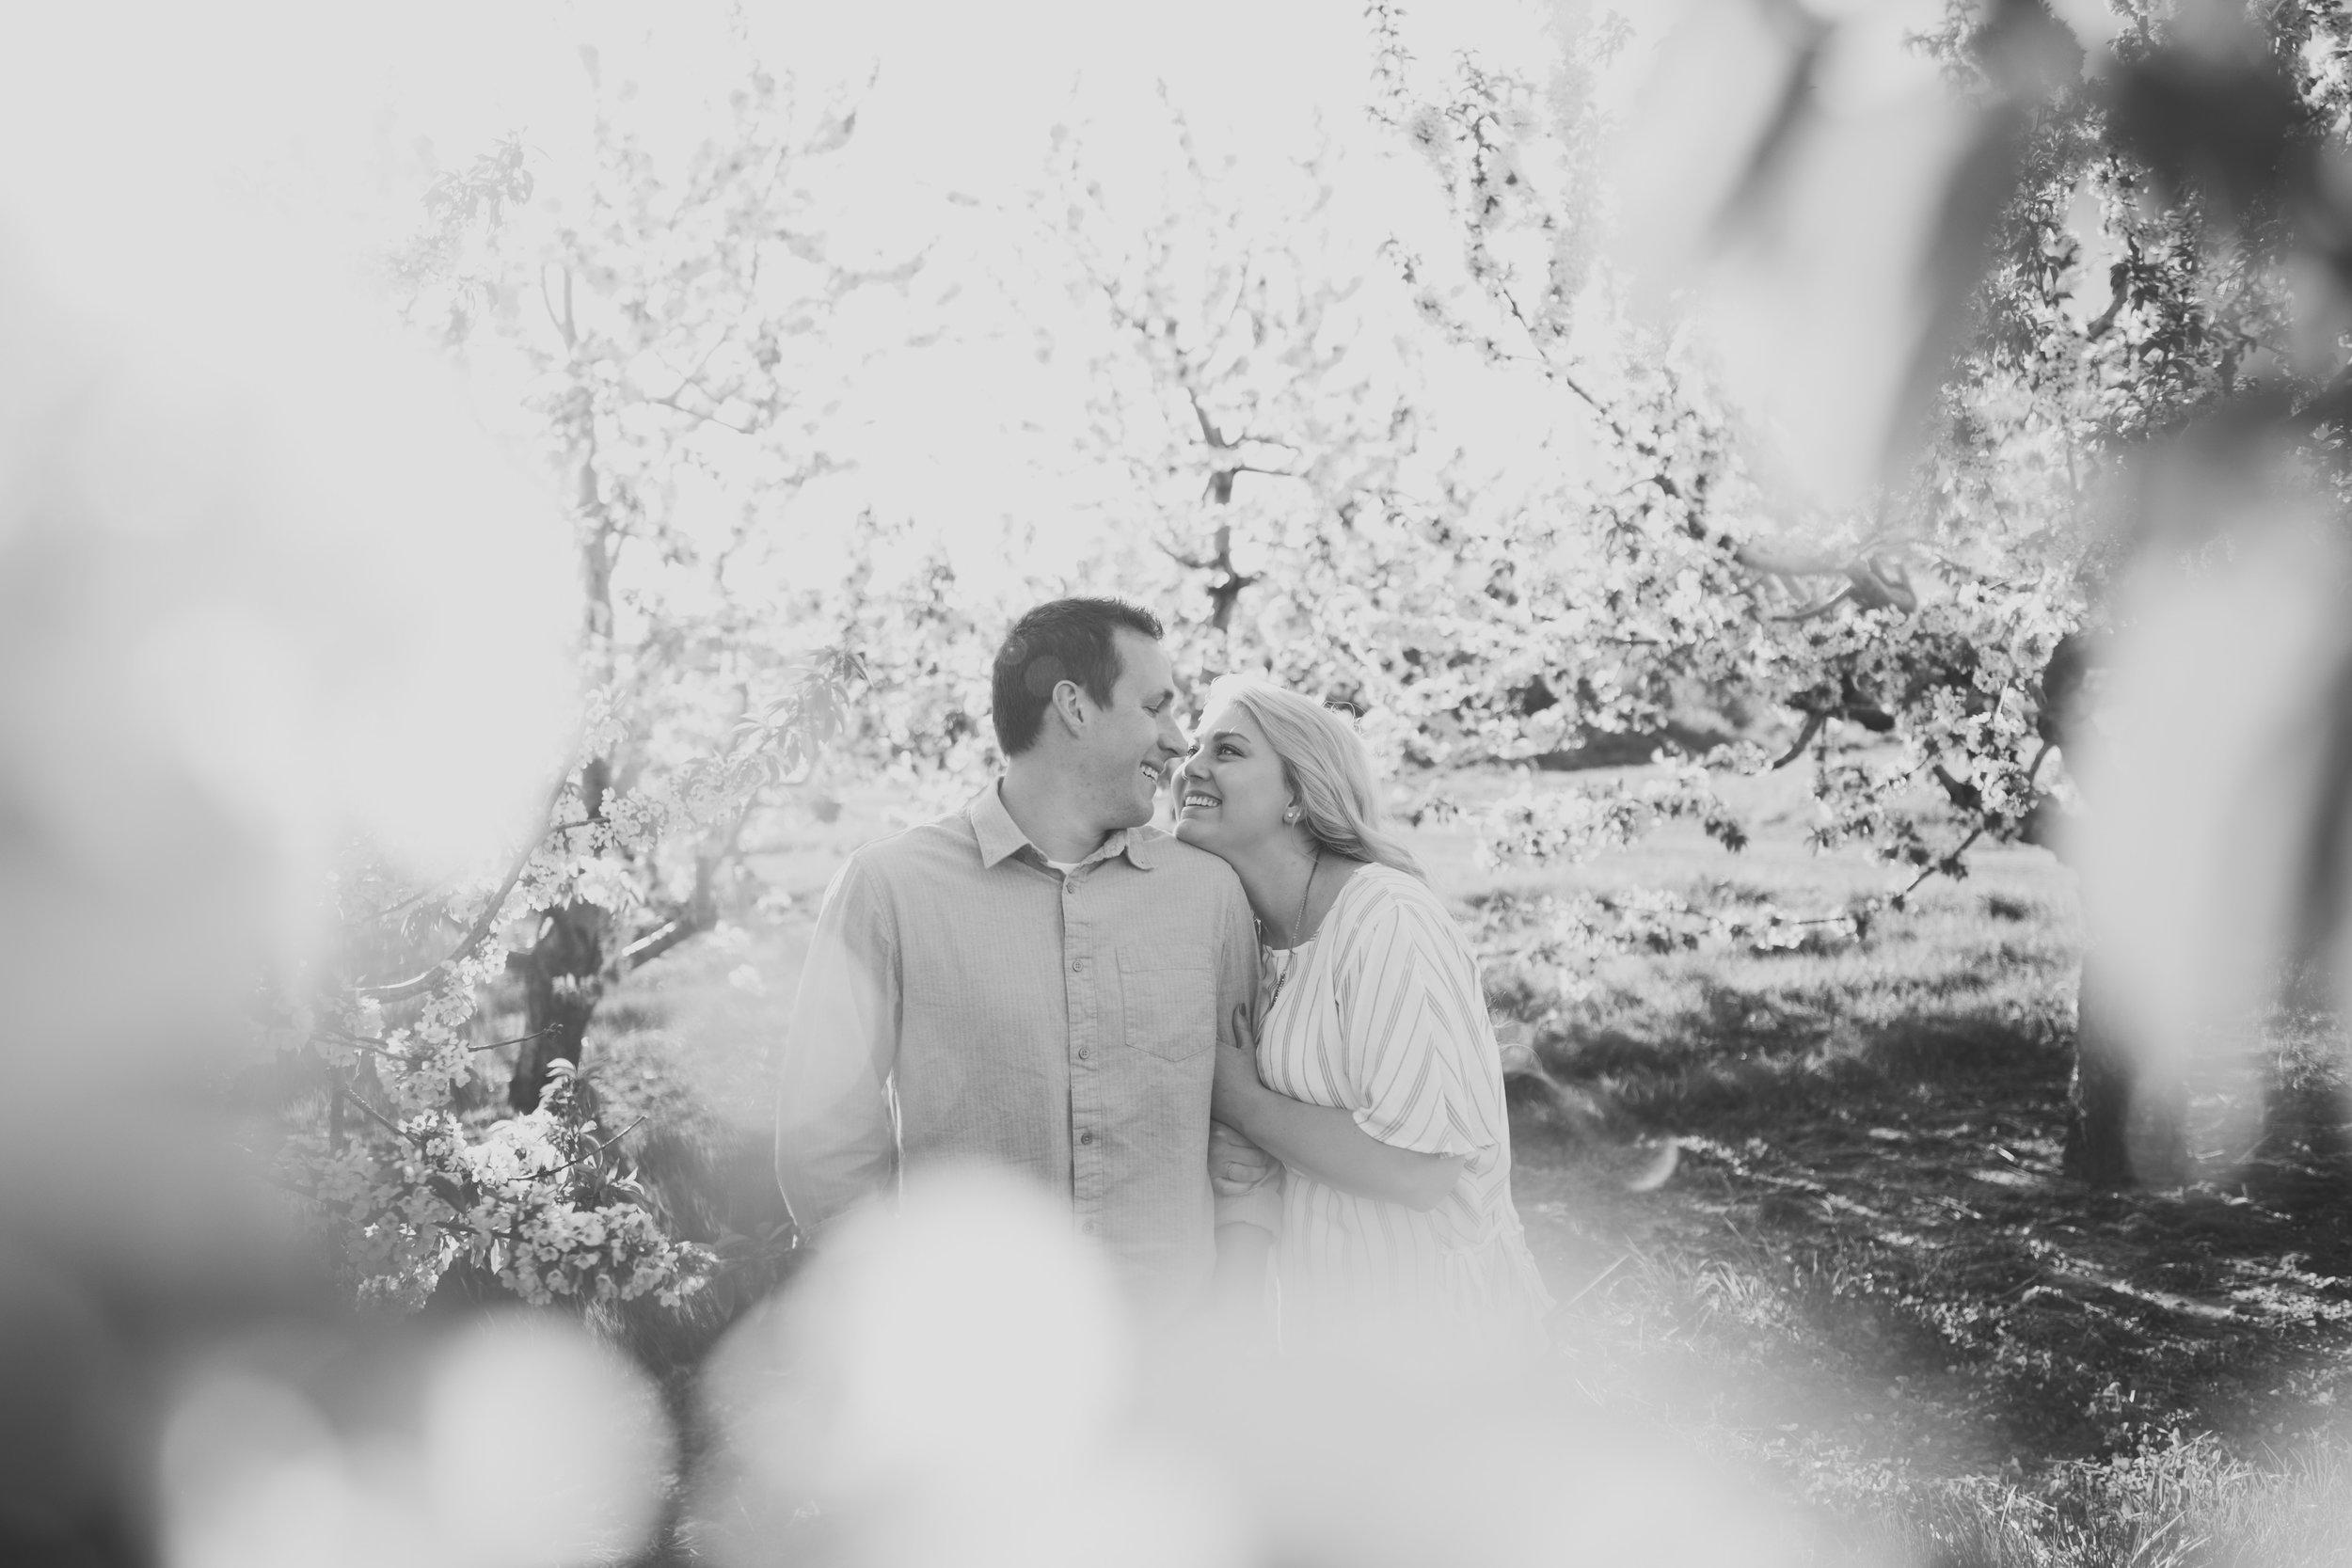 Grand Rapids Photographer - J Darling Photo - jessica darling - grand rapids wedding photographer - sparta airport - sparta michigan - jasmine and jeff engaged 016.jpg